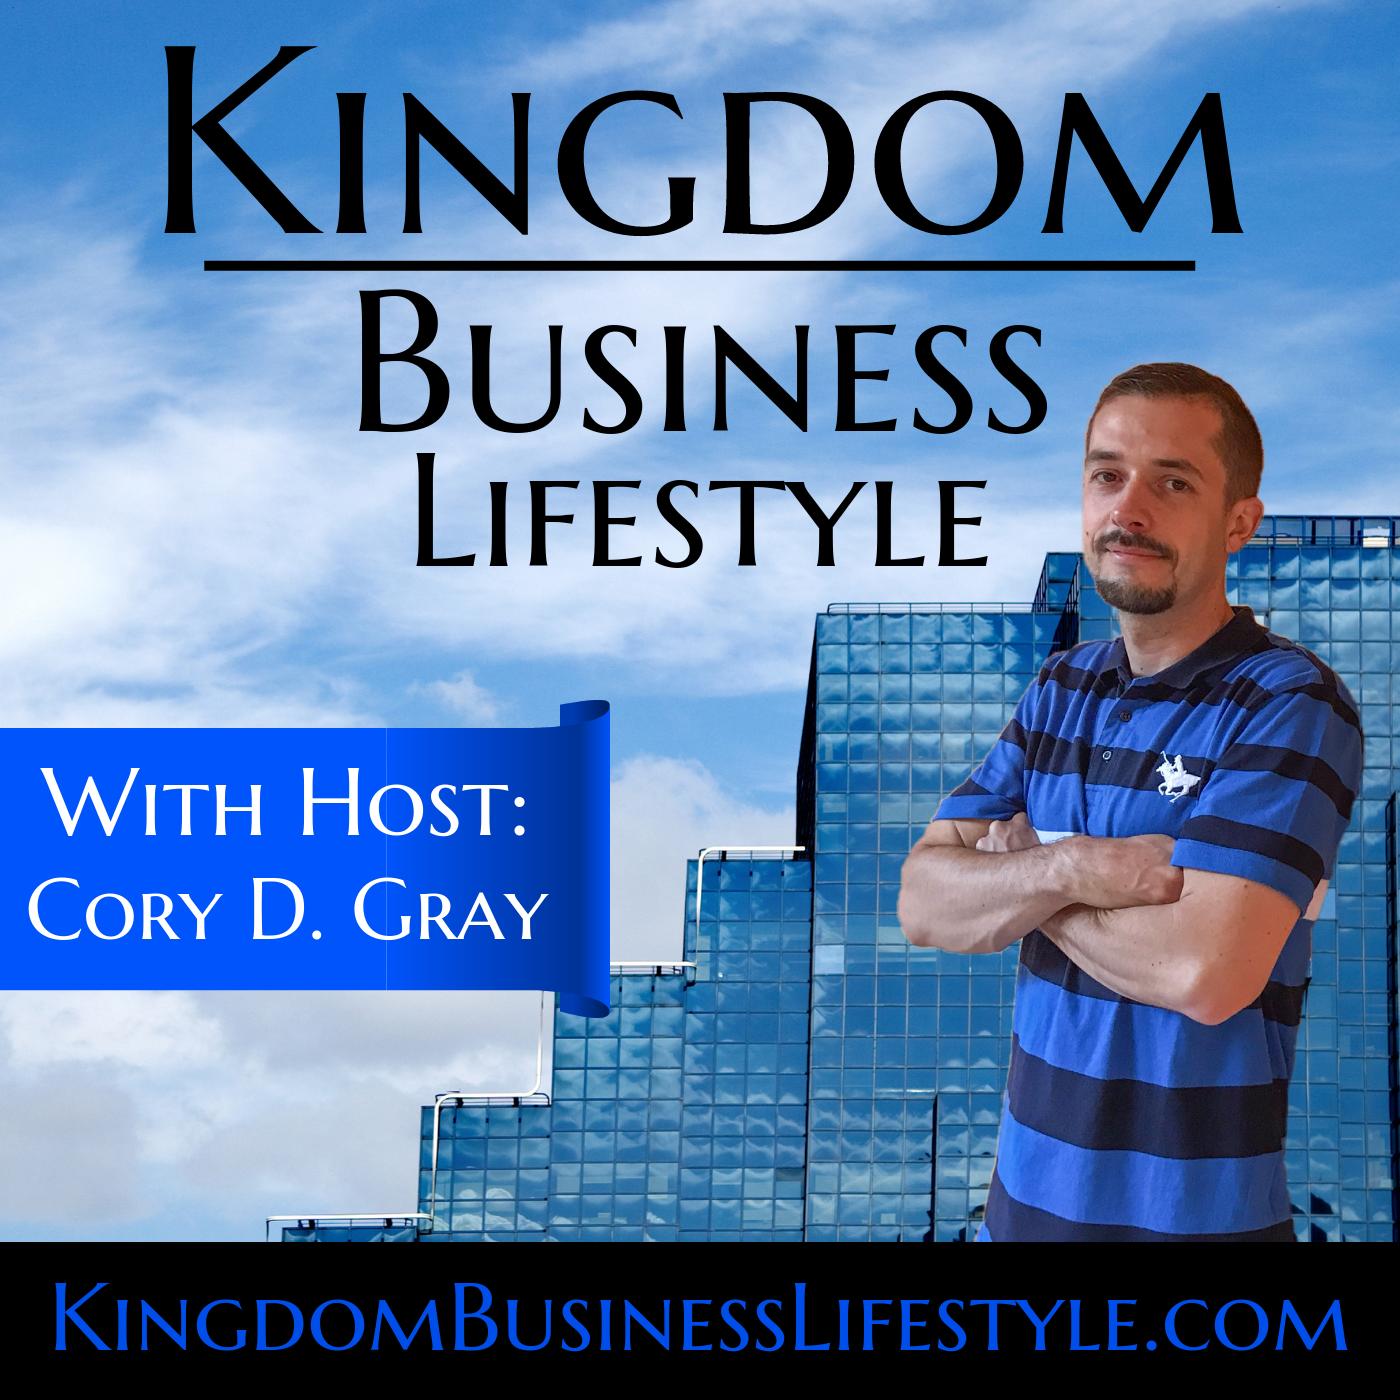 Kingdom Business Lifestyle Podcast show art